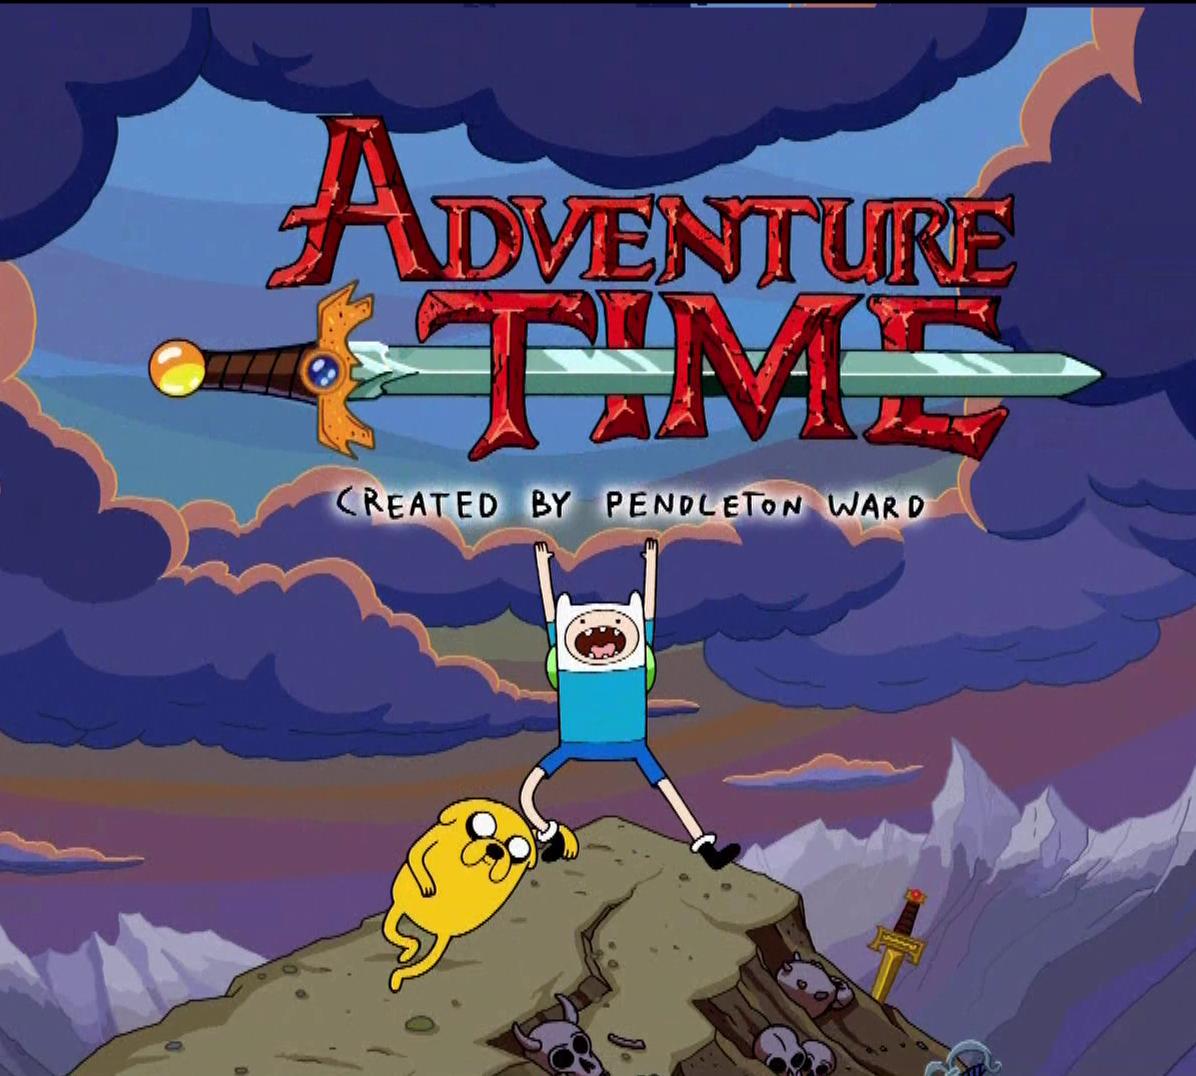 http://4.bp.blogspot.com/-lDLhNQm_w0I/UDrTsSX5jfI/AAAAAAAAM3A/0-v0lXnr3_I/s1600/adventure_time_with_finn_jake1.png